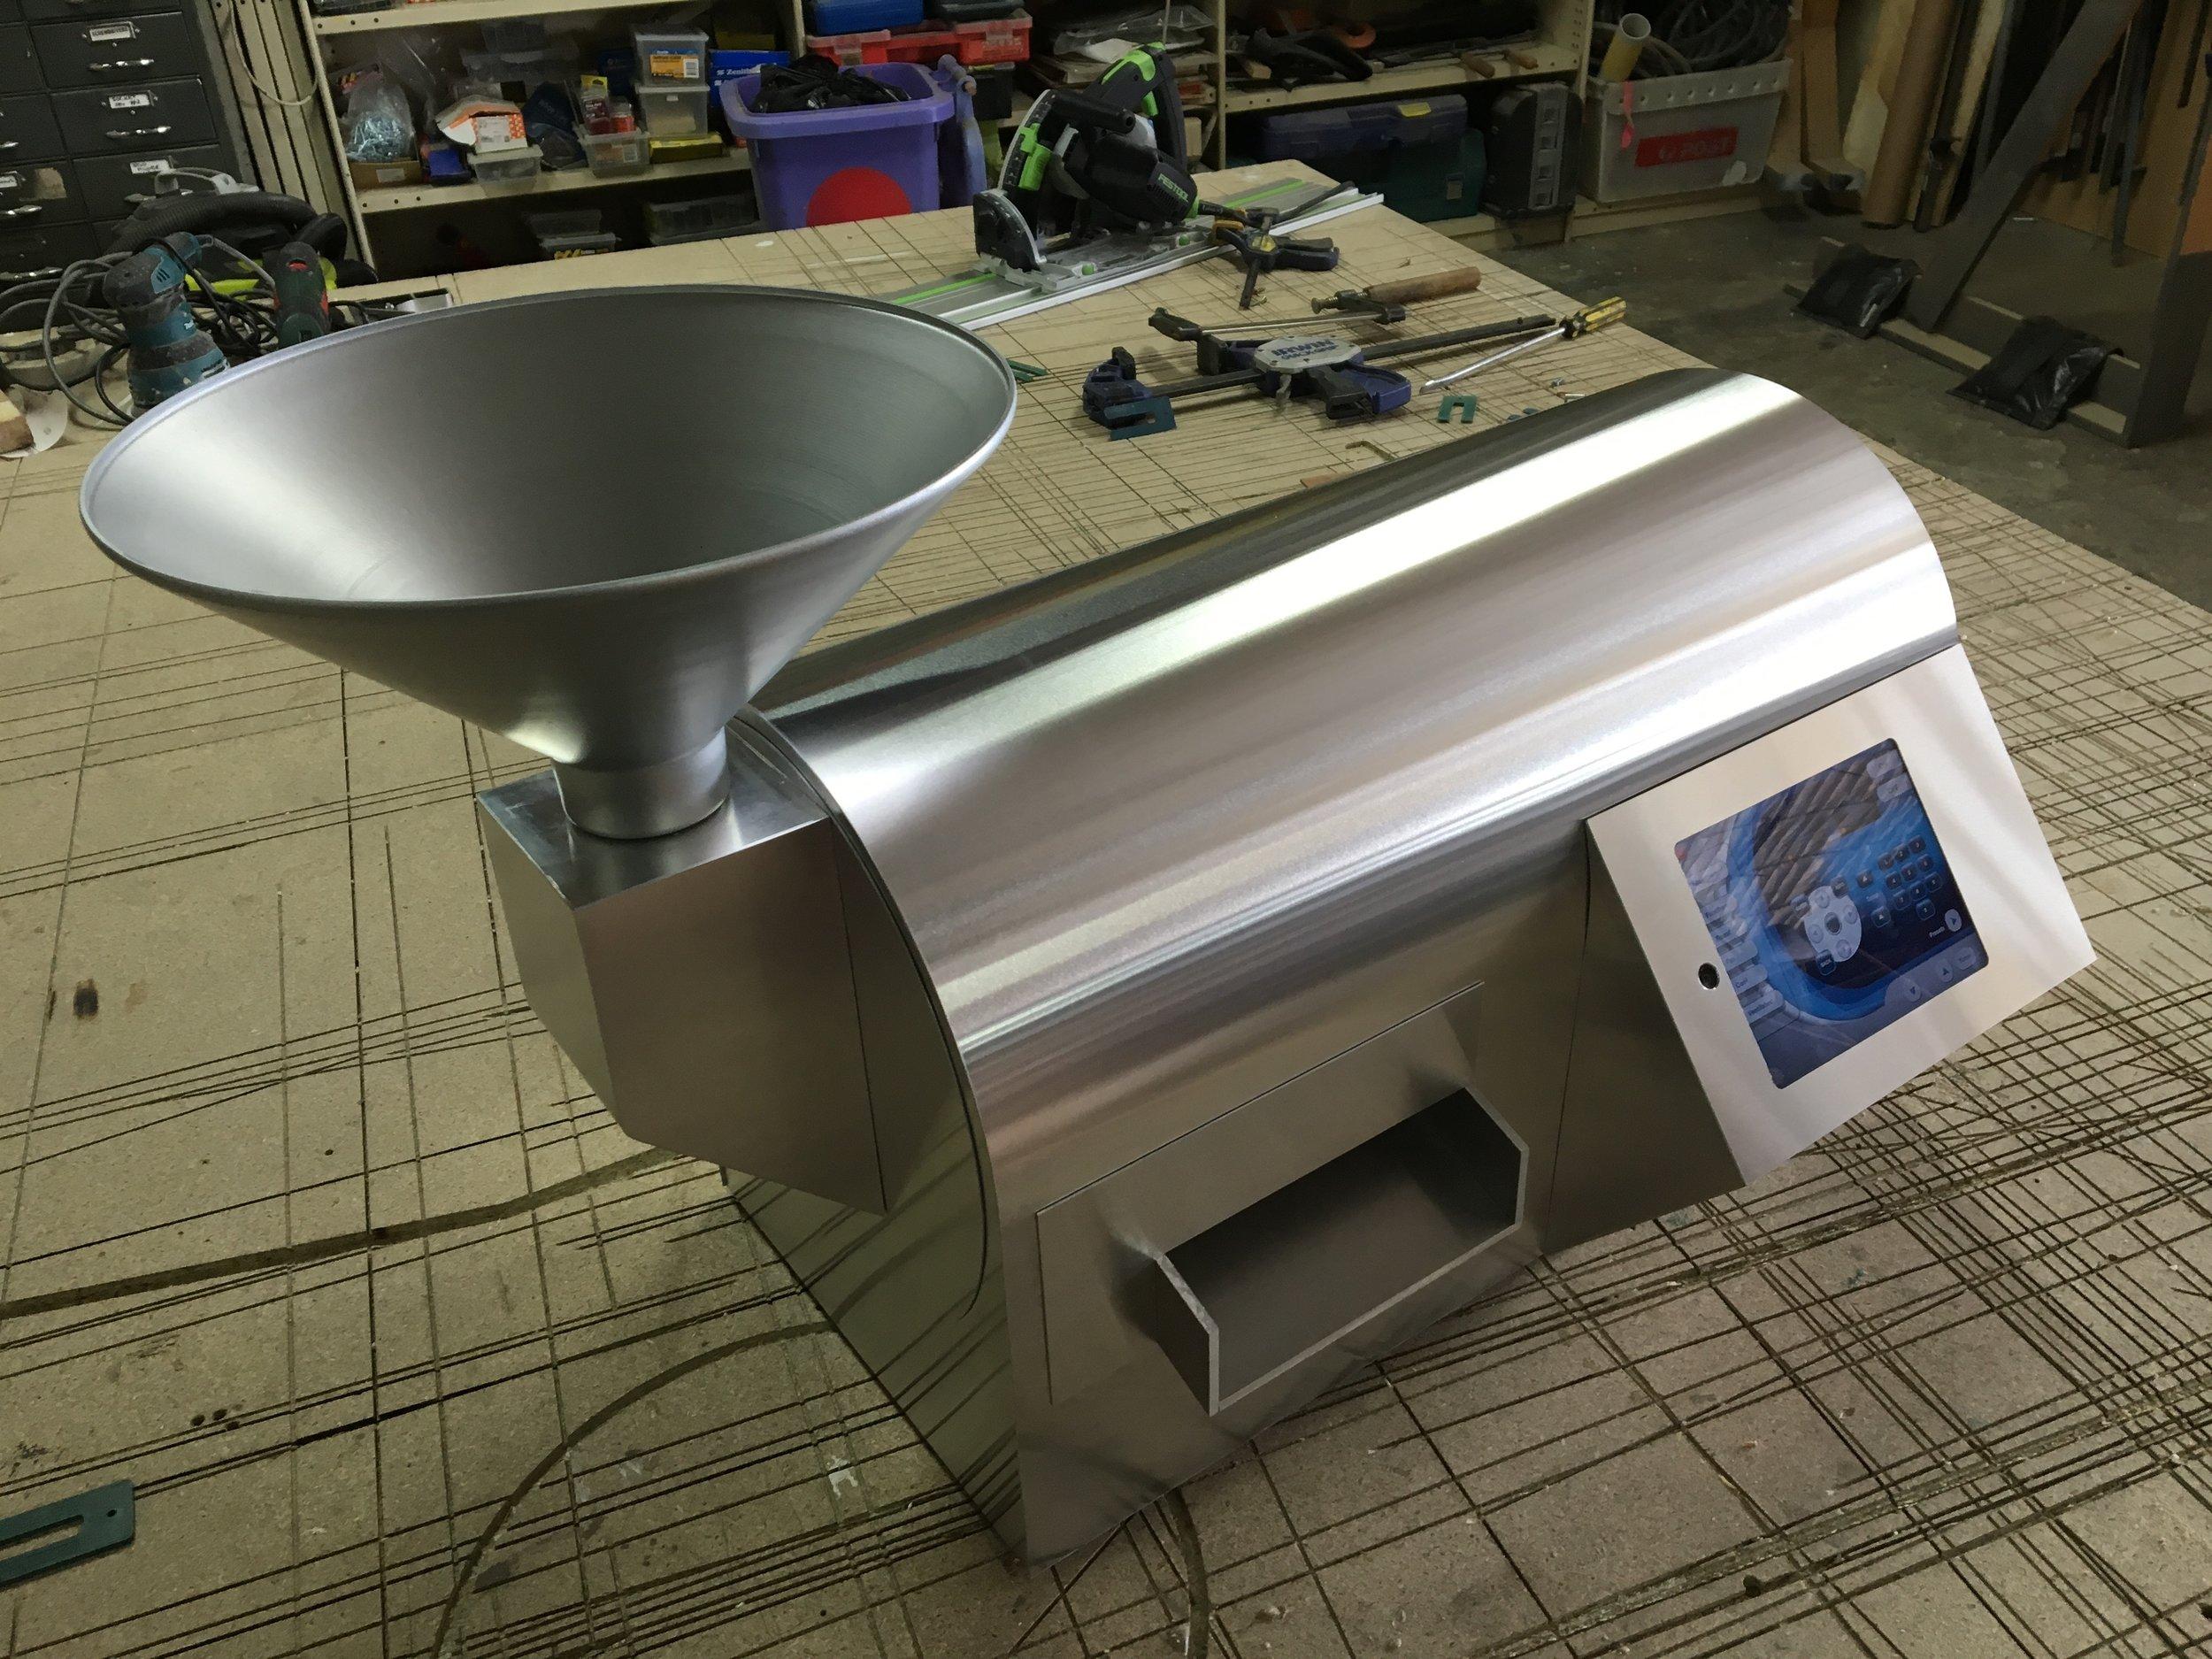 build of dog food machine by Yippee Yi Yay